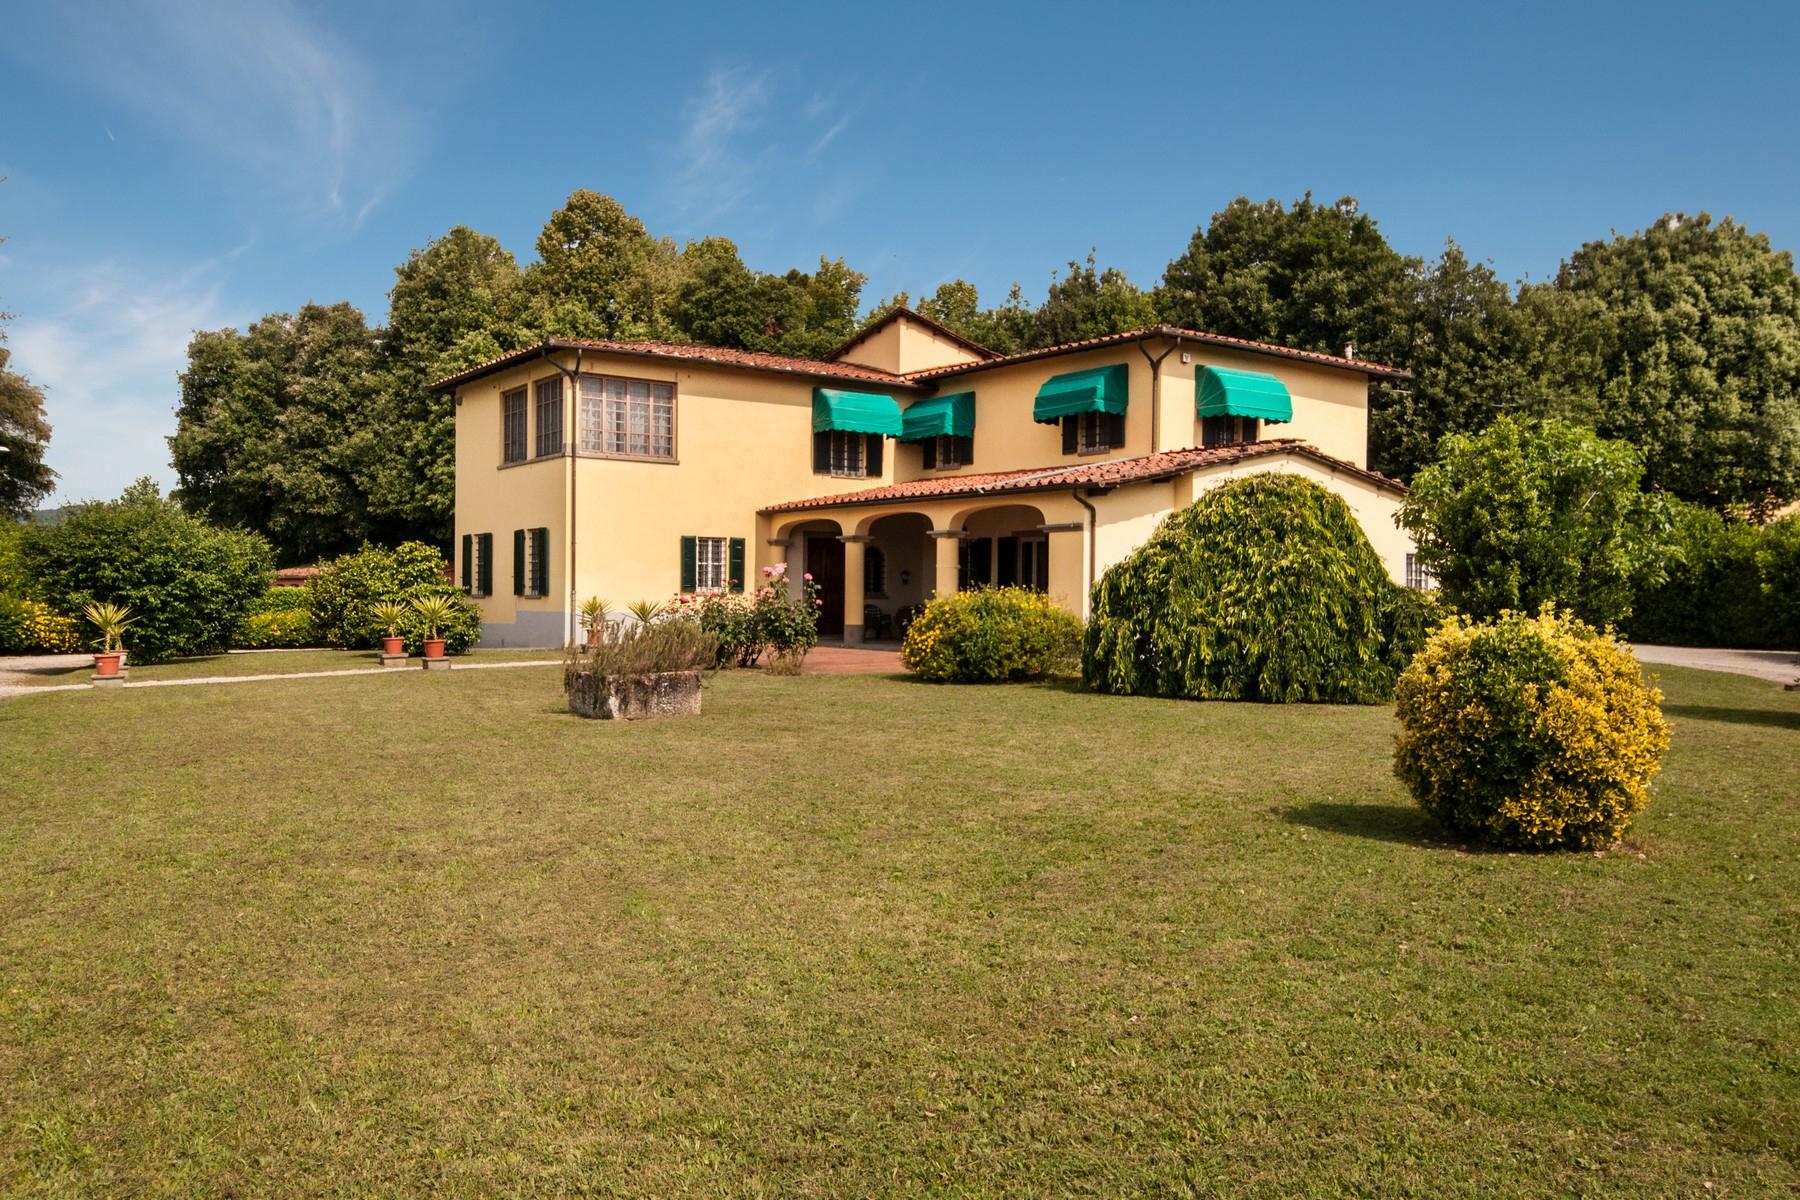 Villa in Vendita a Lucca:  5 locali, 400 mq  - Foto 1